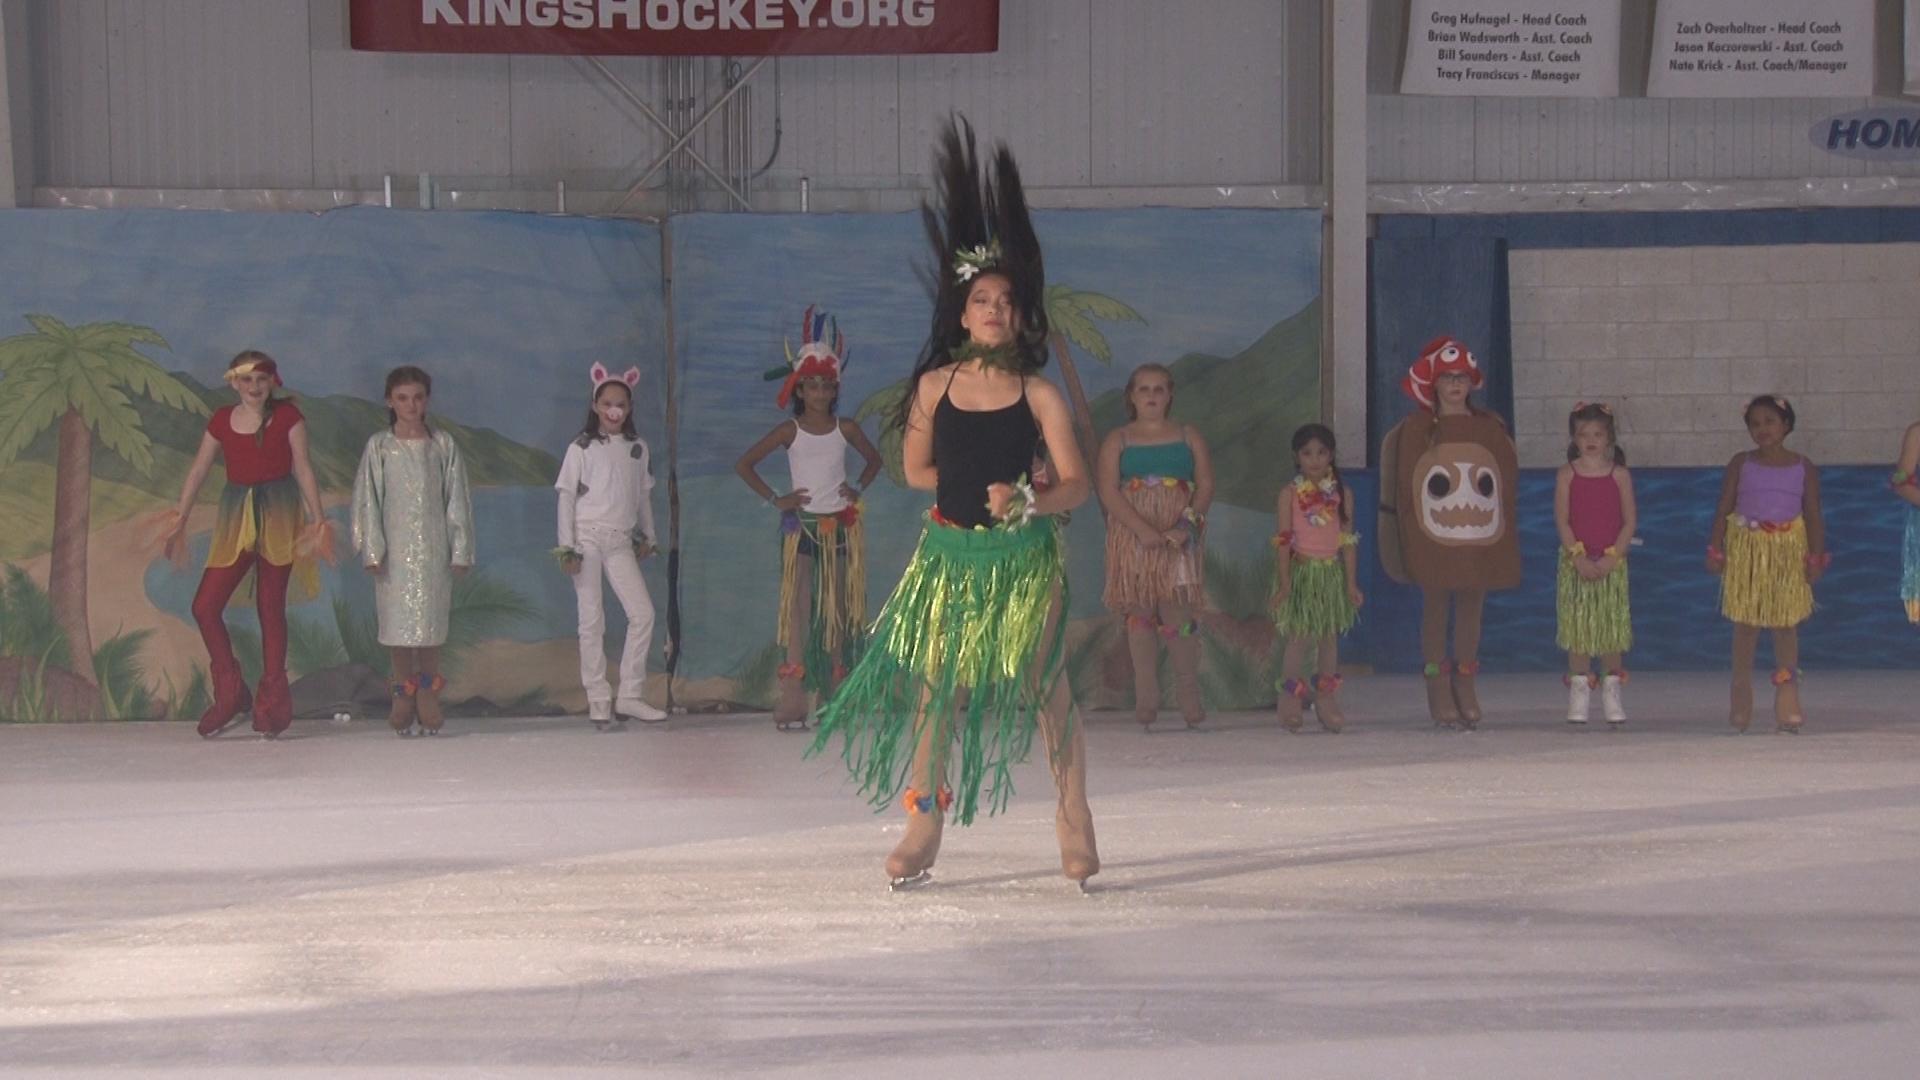 Power Play Maui Skate on Ice 071417.01_00_17_22.Still099.jpg